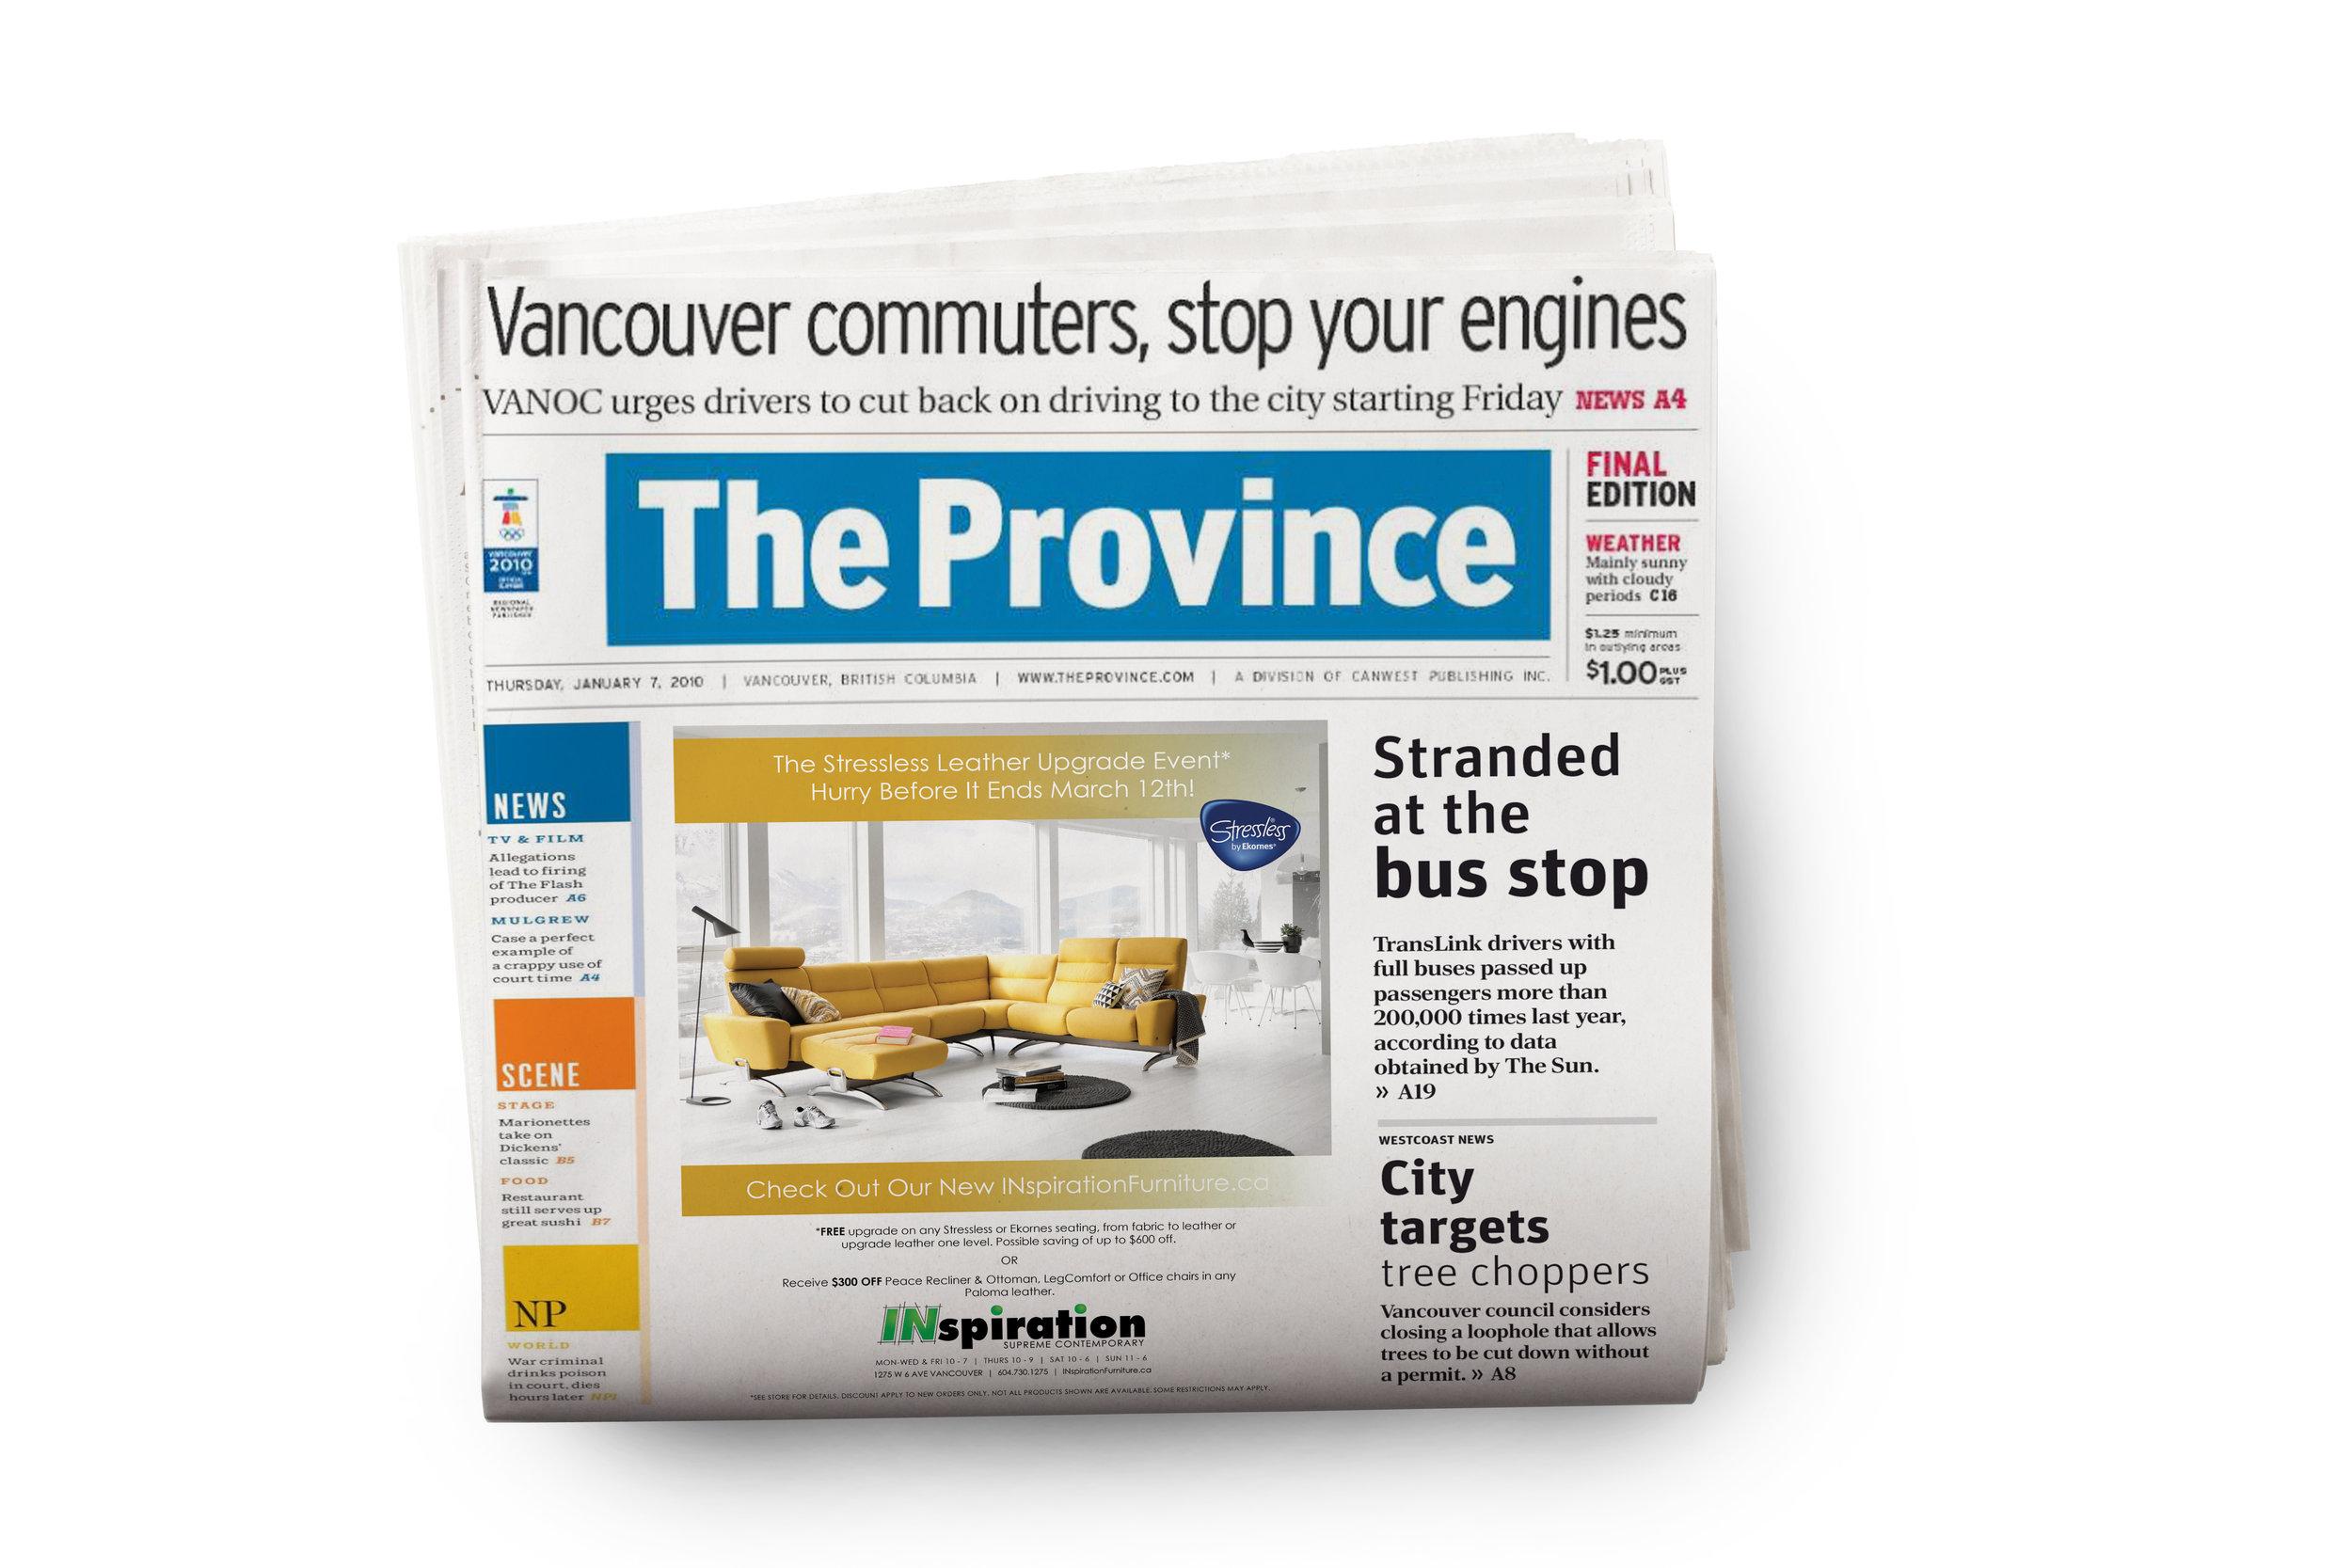 IN_Province_Newspaper6.jpg